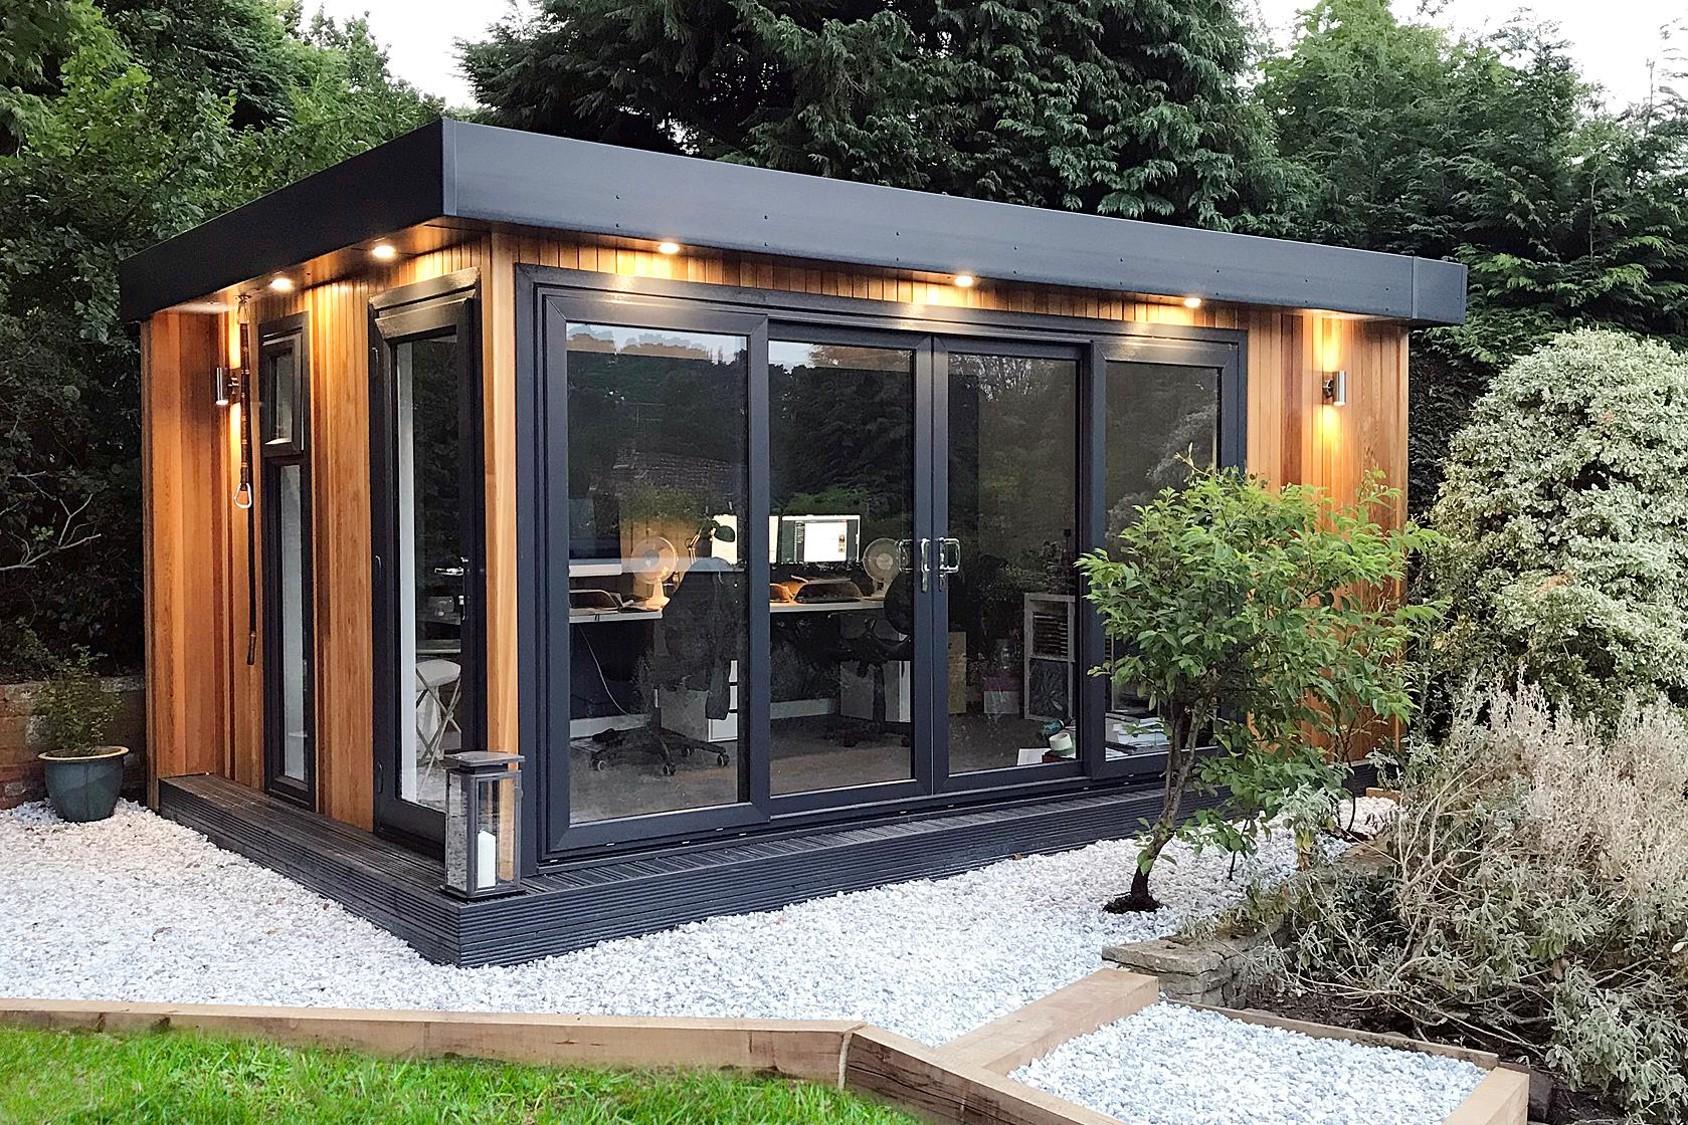 JJL Interior & Property Services